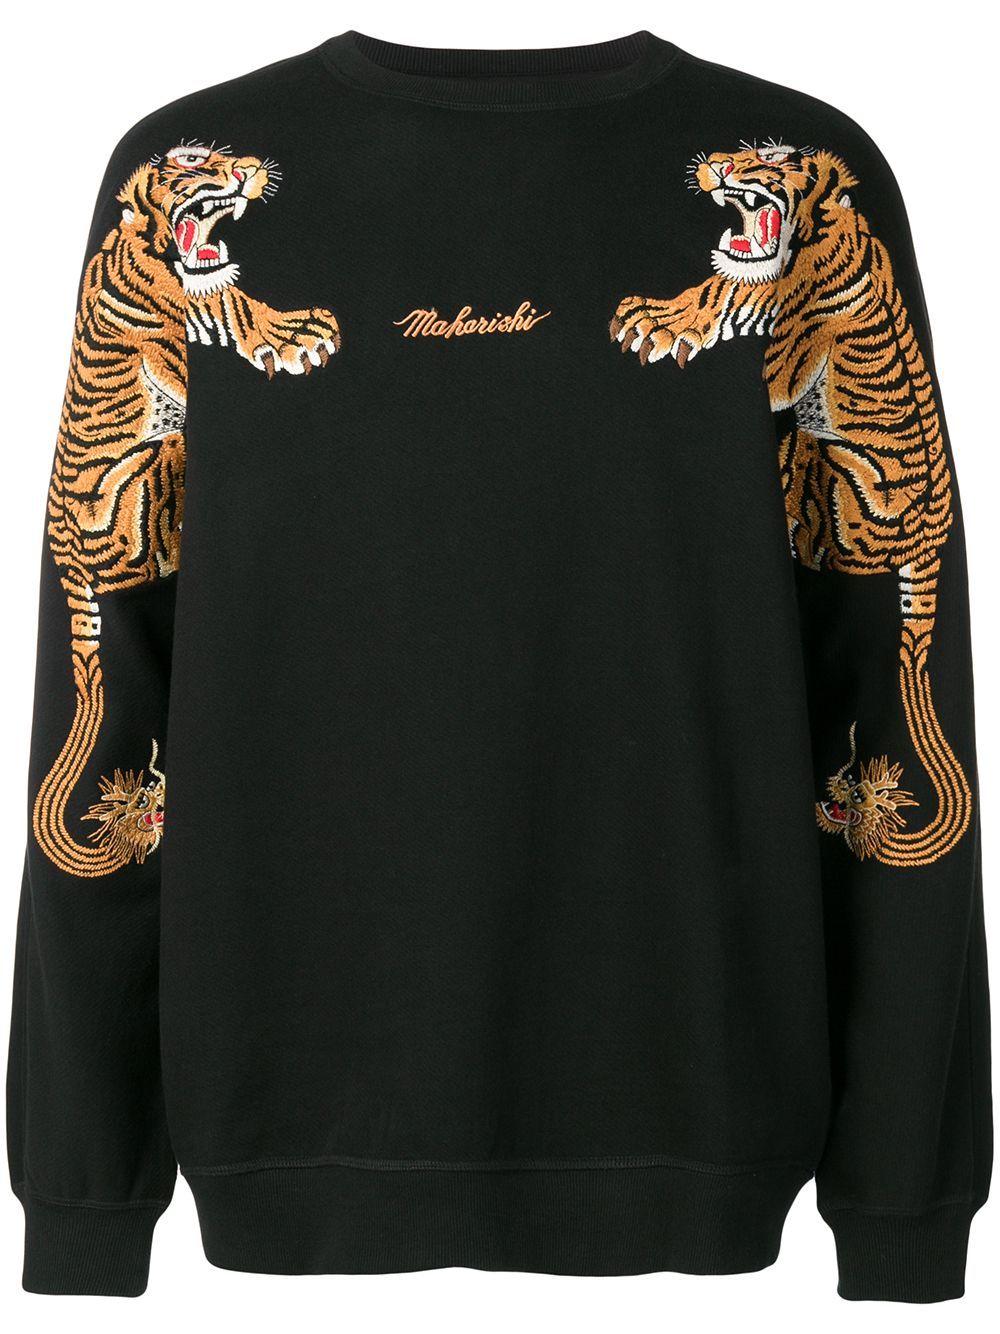 aa2f9e5b9 MAHARISHI MAHARISHI TIGER STYLE SWEATSHIRT - 黑色. #maharishi #cloth ...